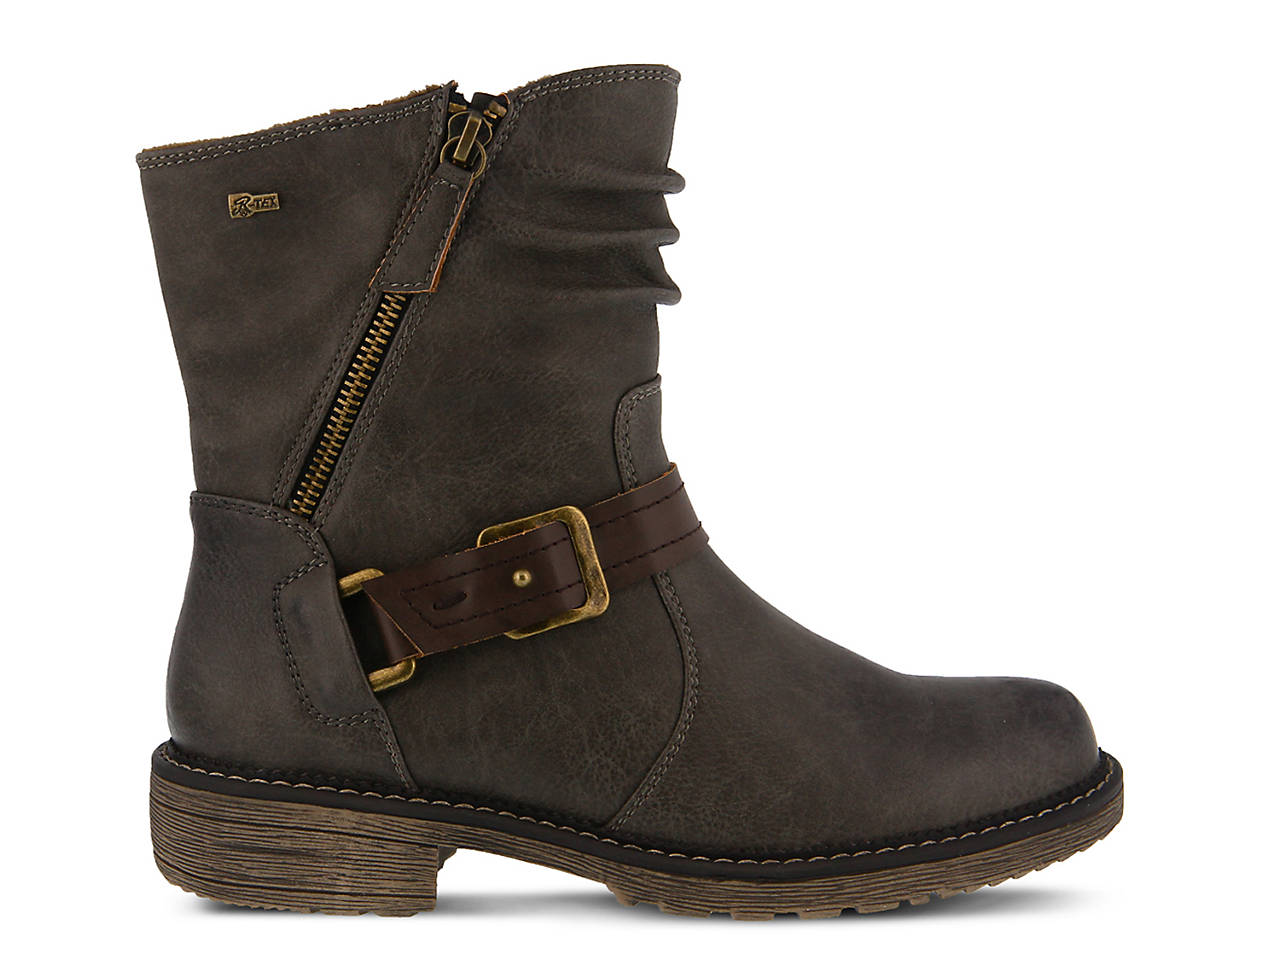 Spring Step Feijo Ankle Boot (Women's) 3win2rBJ